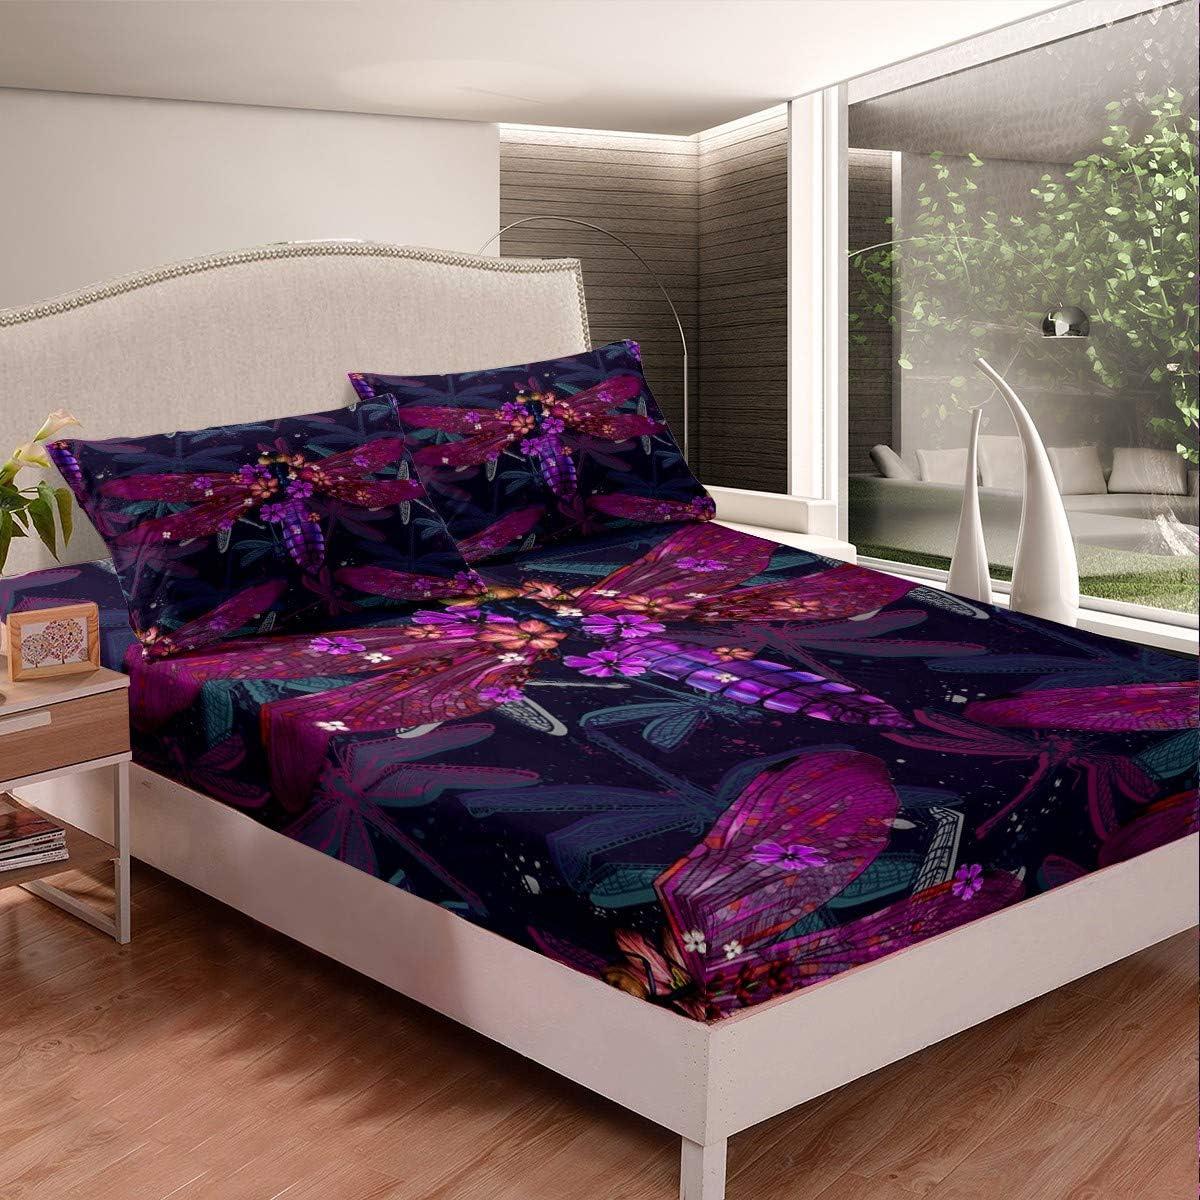 Erosebridal Purple Dragonfly Bedding Wholesale Set Animals Moth Arlington Mall Bed Cover